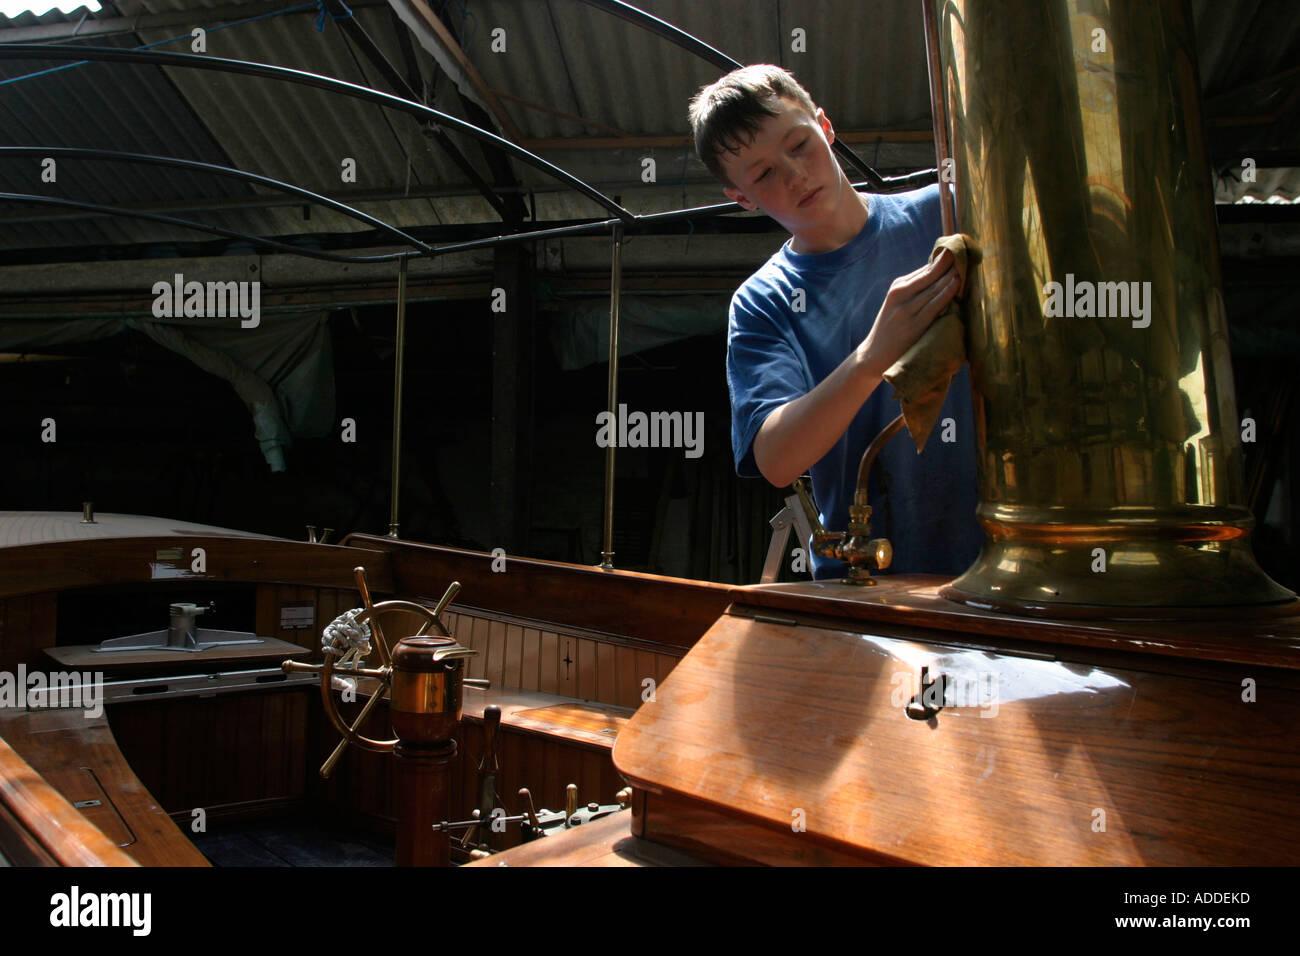 Hambleden Jake, 16, polishes the funnel of a Thames steam boat in the Henwood and Ding boatyard on the Hambleden estate - Stock Image